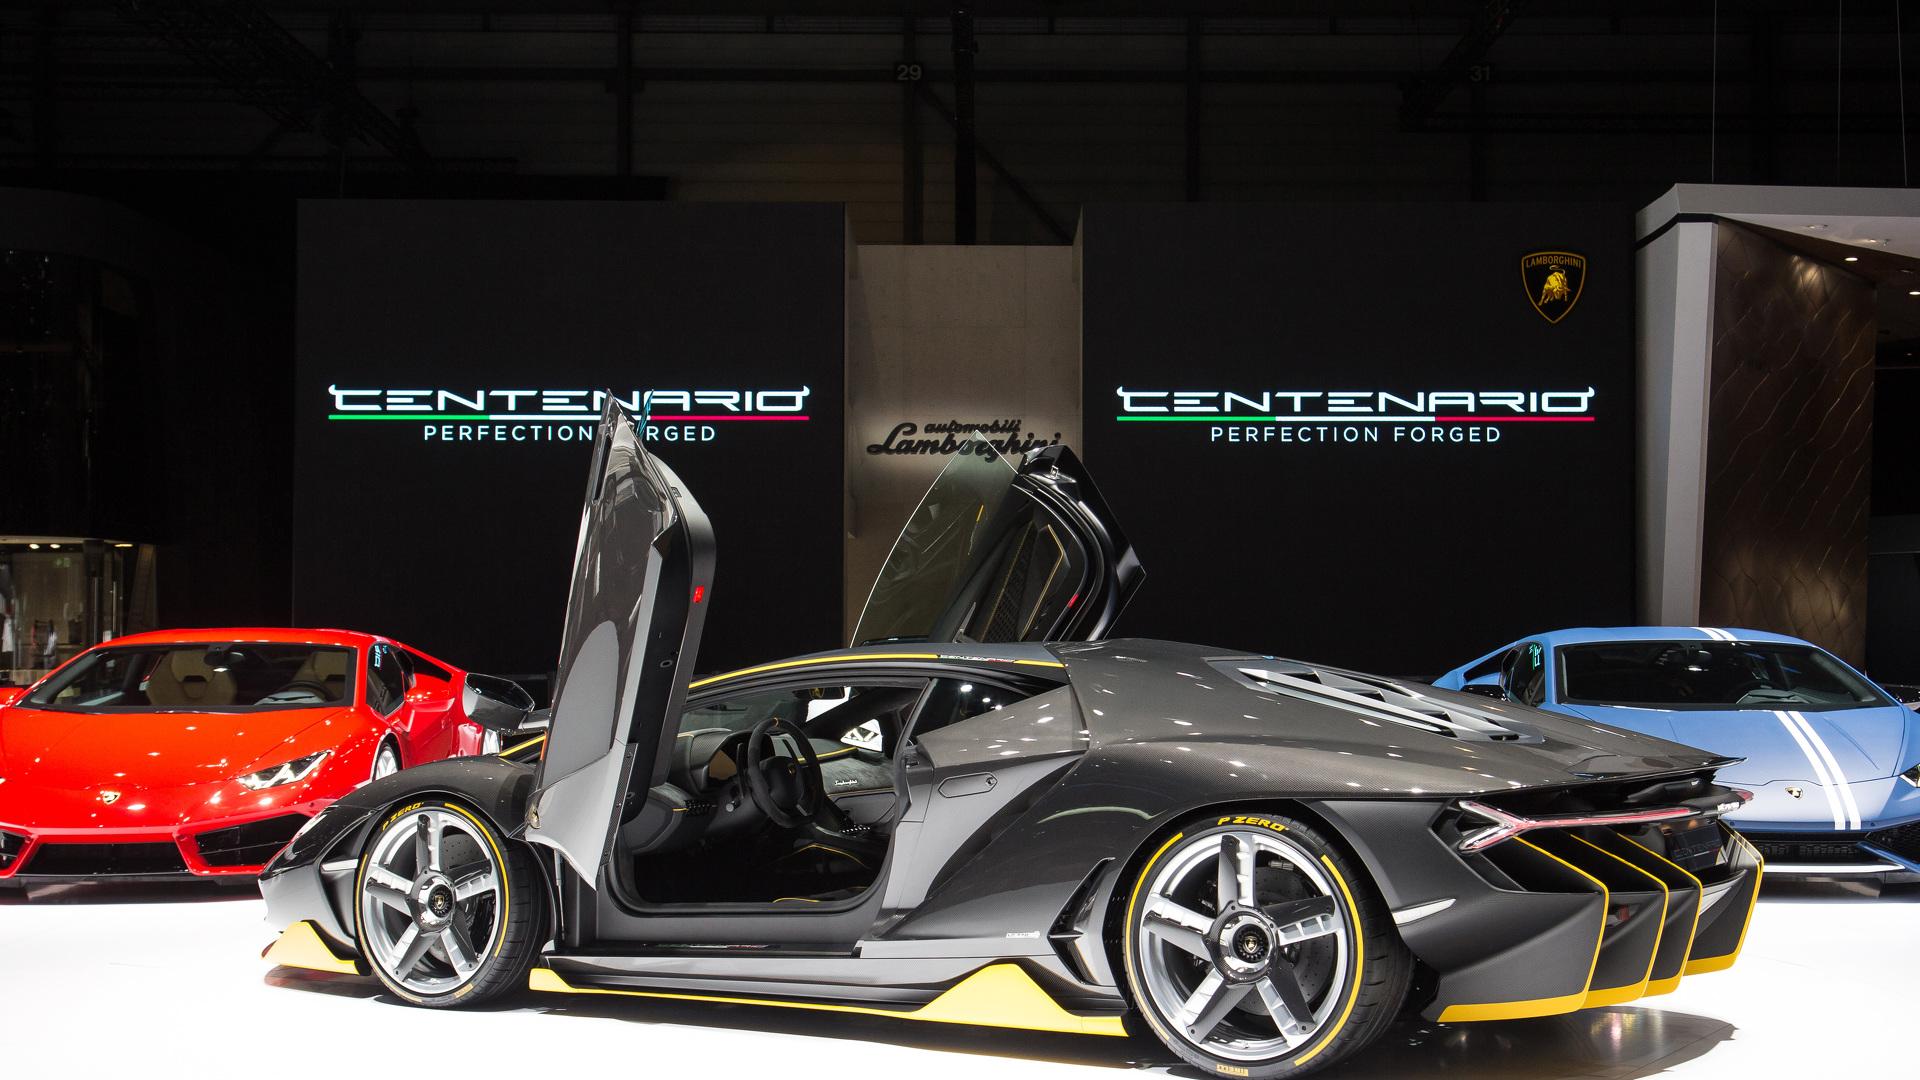 Lamborghini Centenario Lp 770 4 News And Reviews Motor1 Com